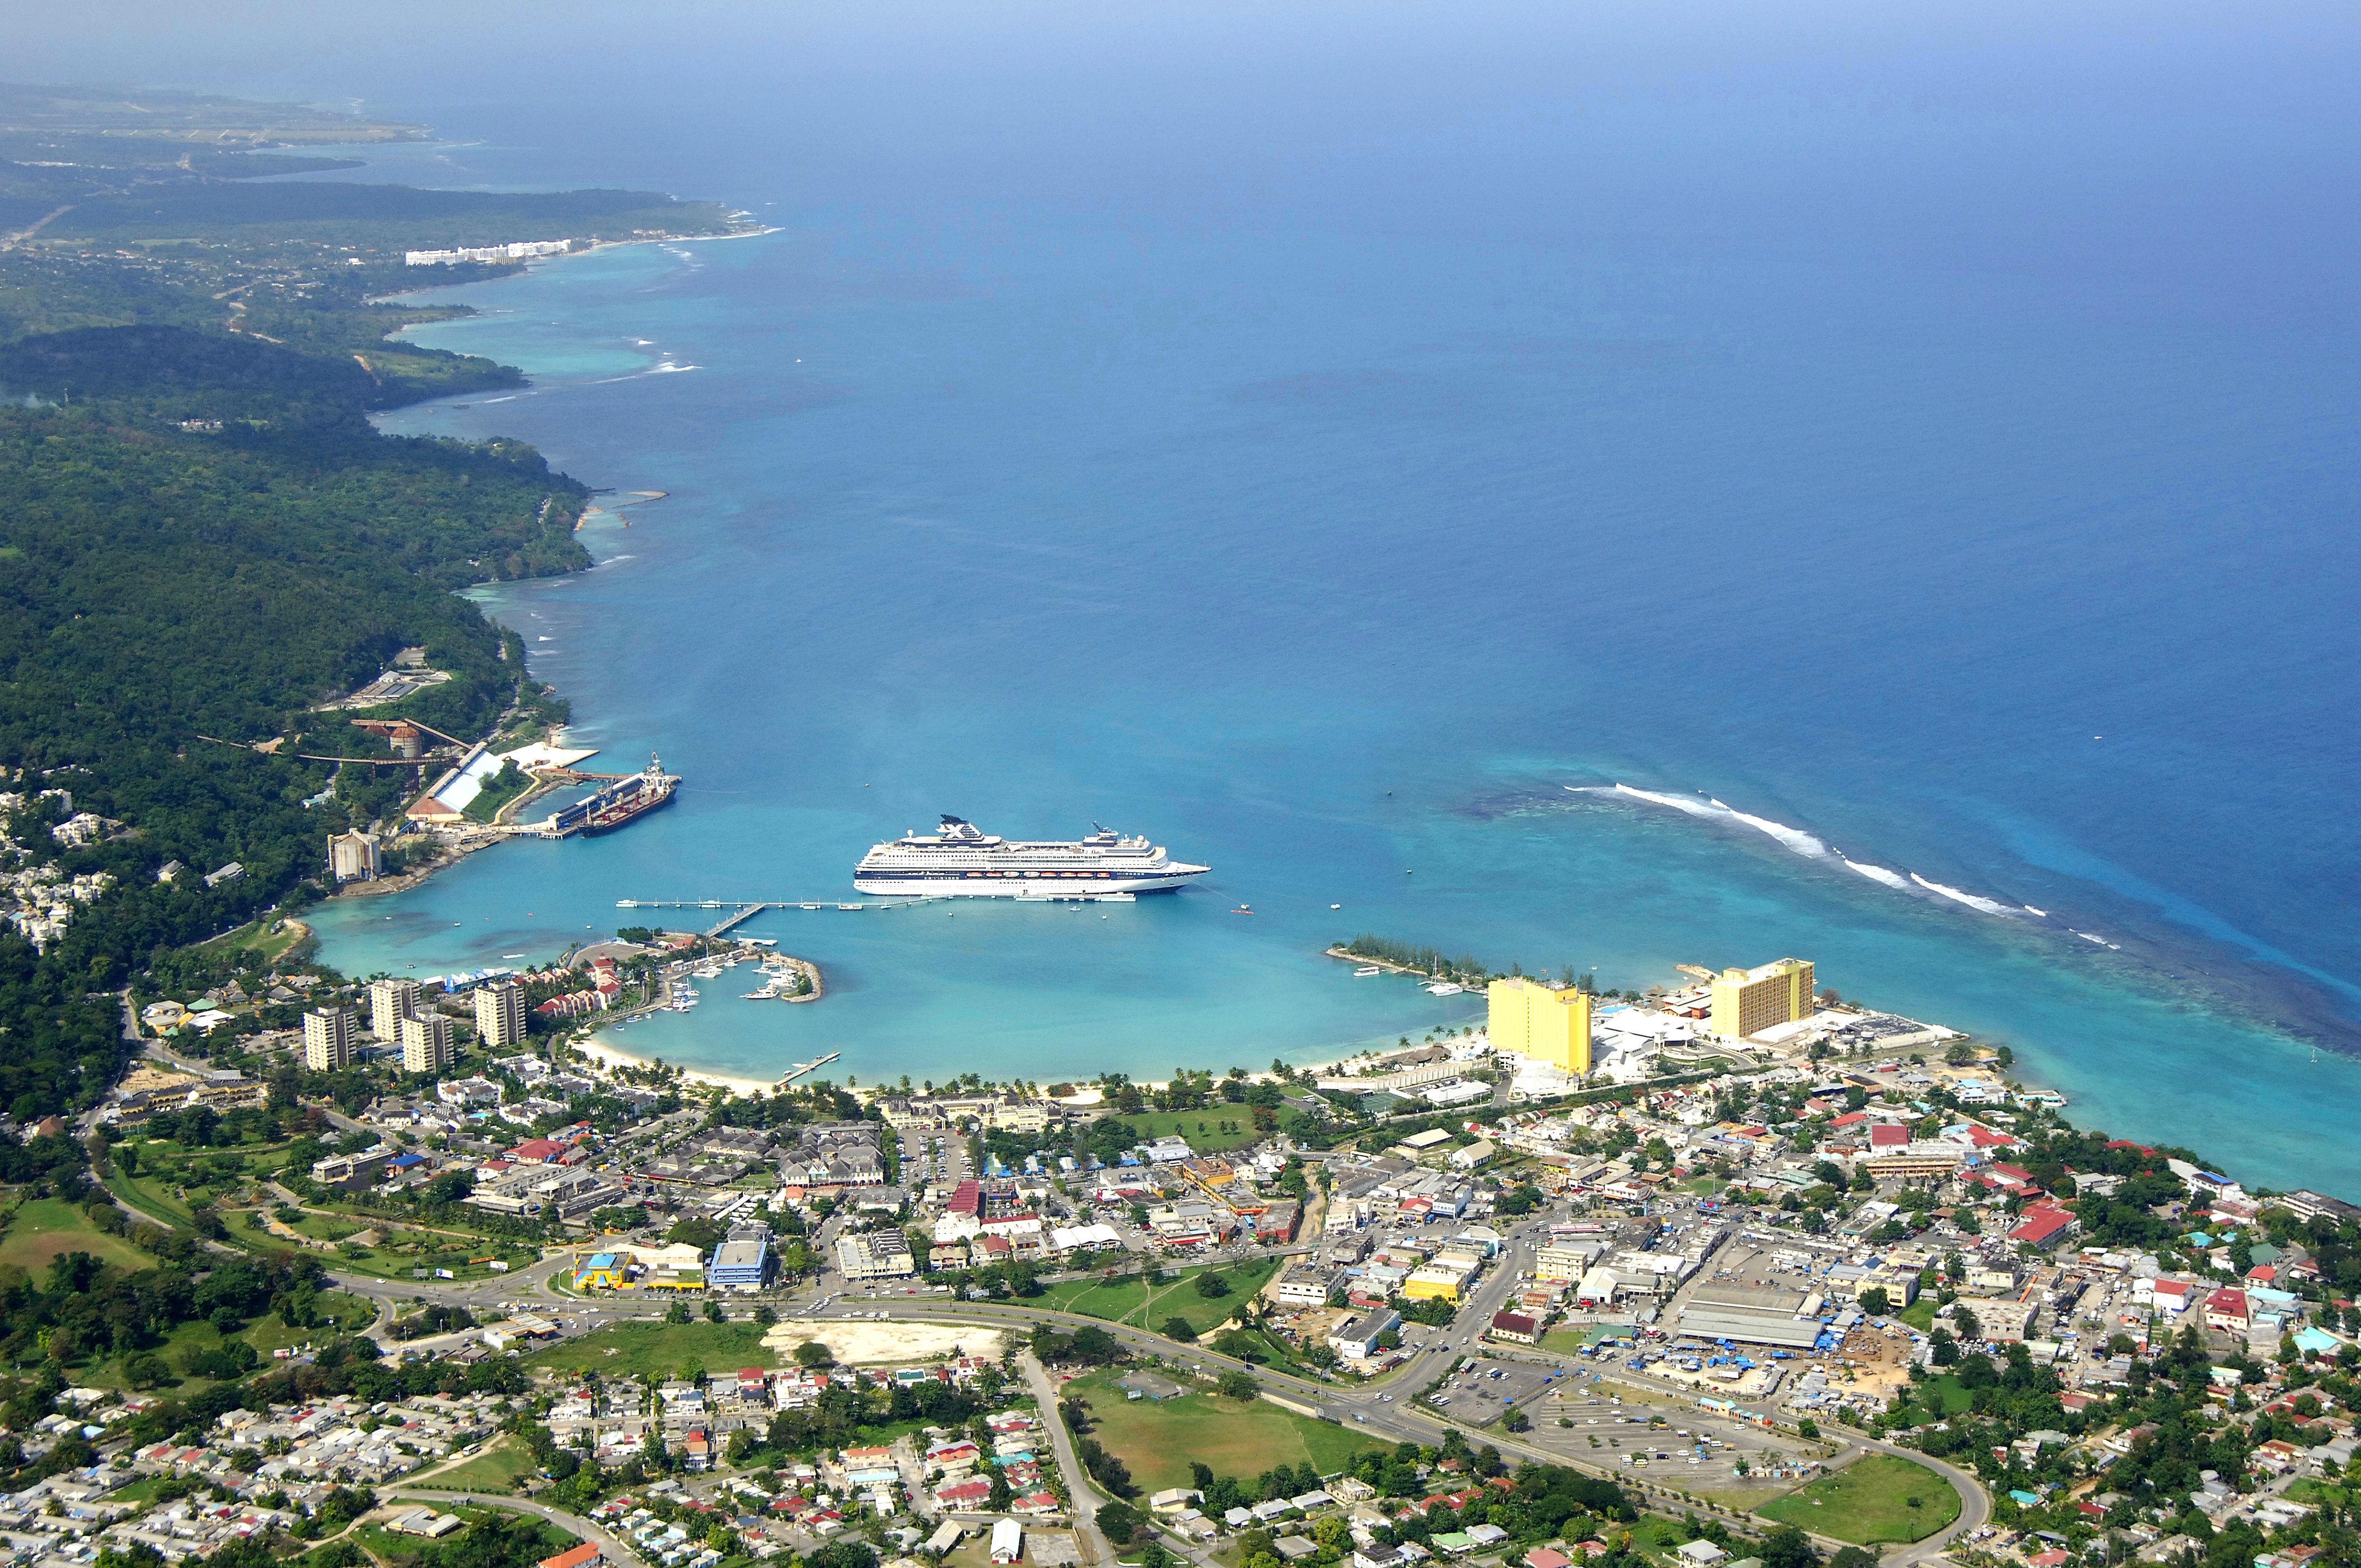 Resort Sandals Royal Plantation, Ocho Rios, Jamaica